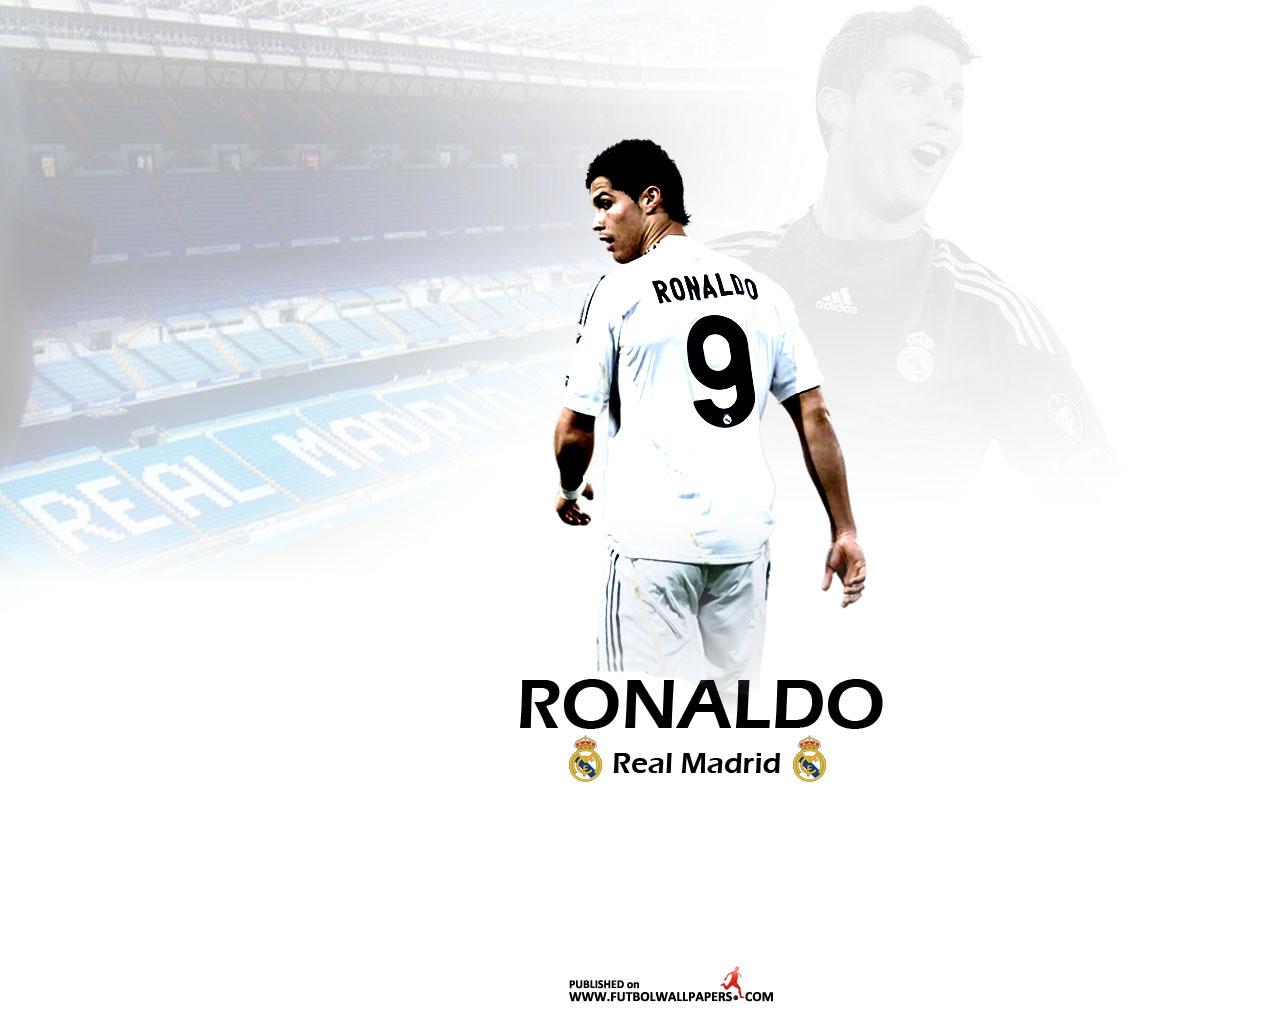 http://4.bp.blogspot.com/--8pbTluLyT0/Tja3QKvpkZI/AAAAAAAACFs/ejJmMato8ZI/s1600/Cristiano-Ronaldo-Real-Madrid-Wallpaper-2011-3.jpg